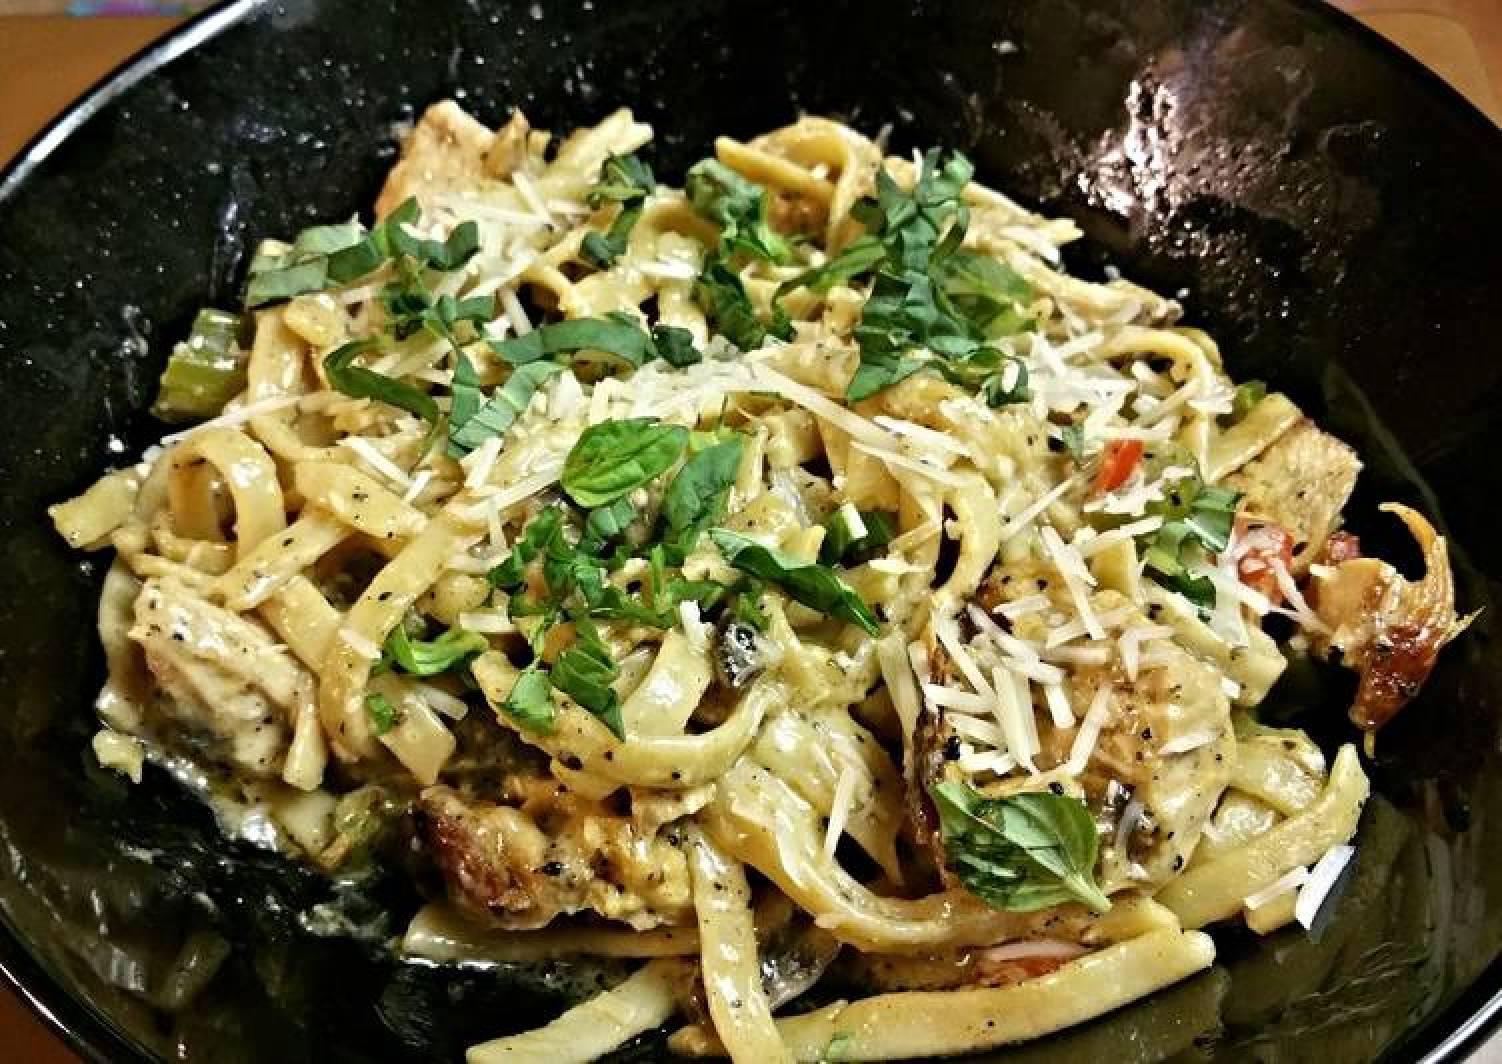 Chicken Fettuccine Alfredo with Vegetables